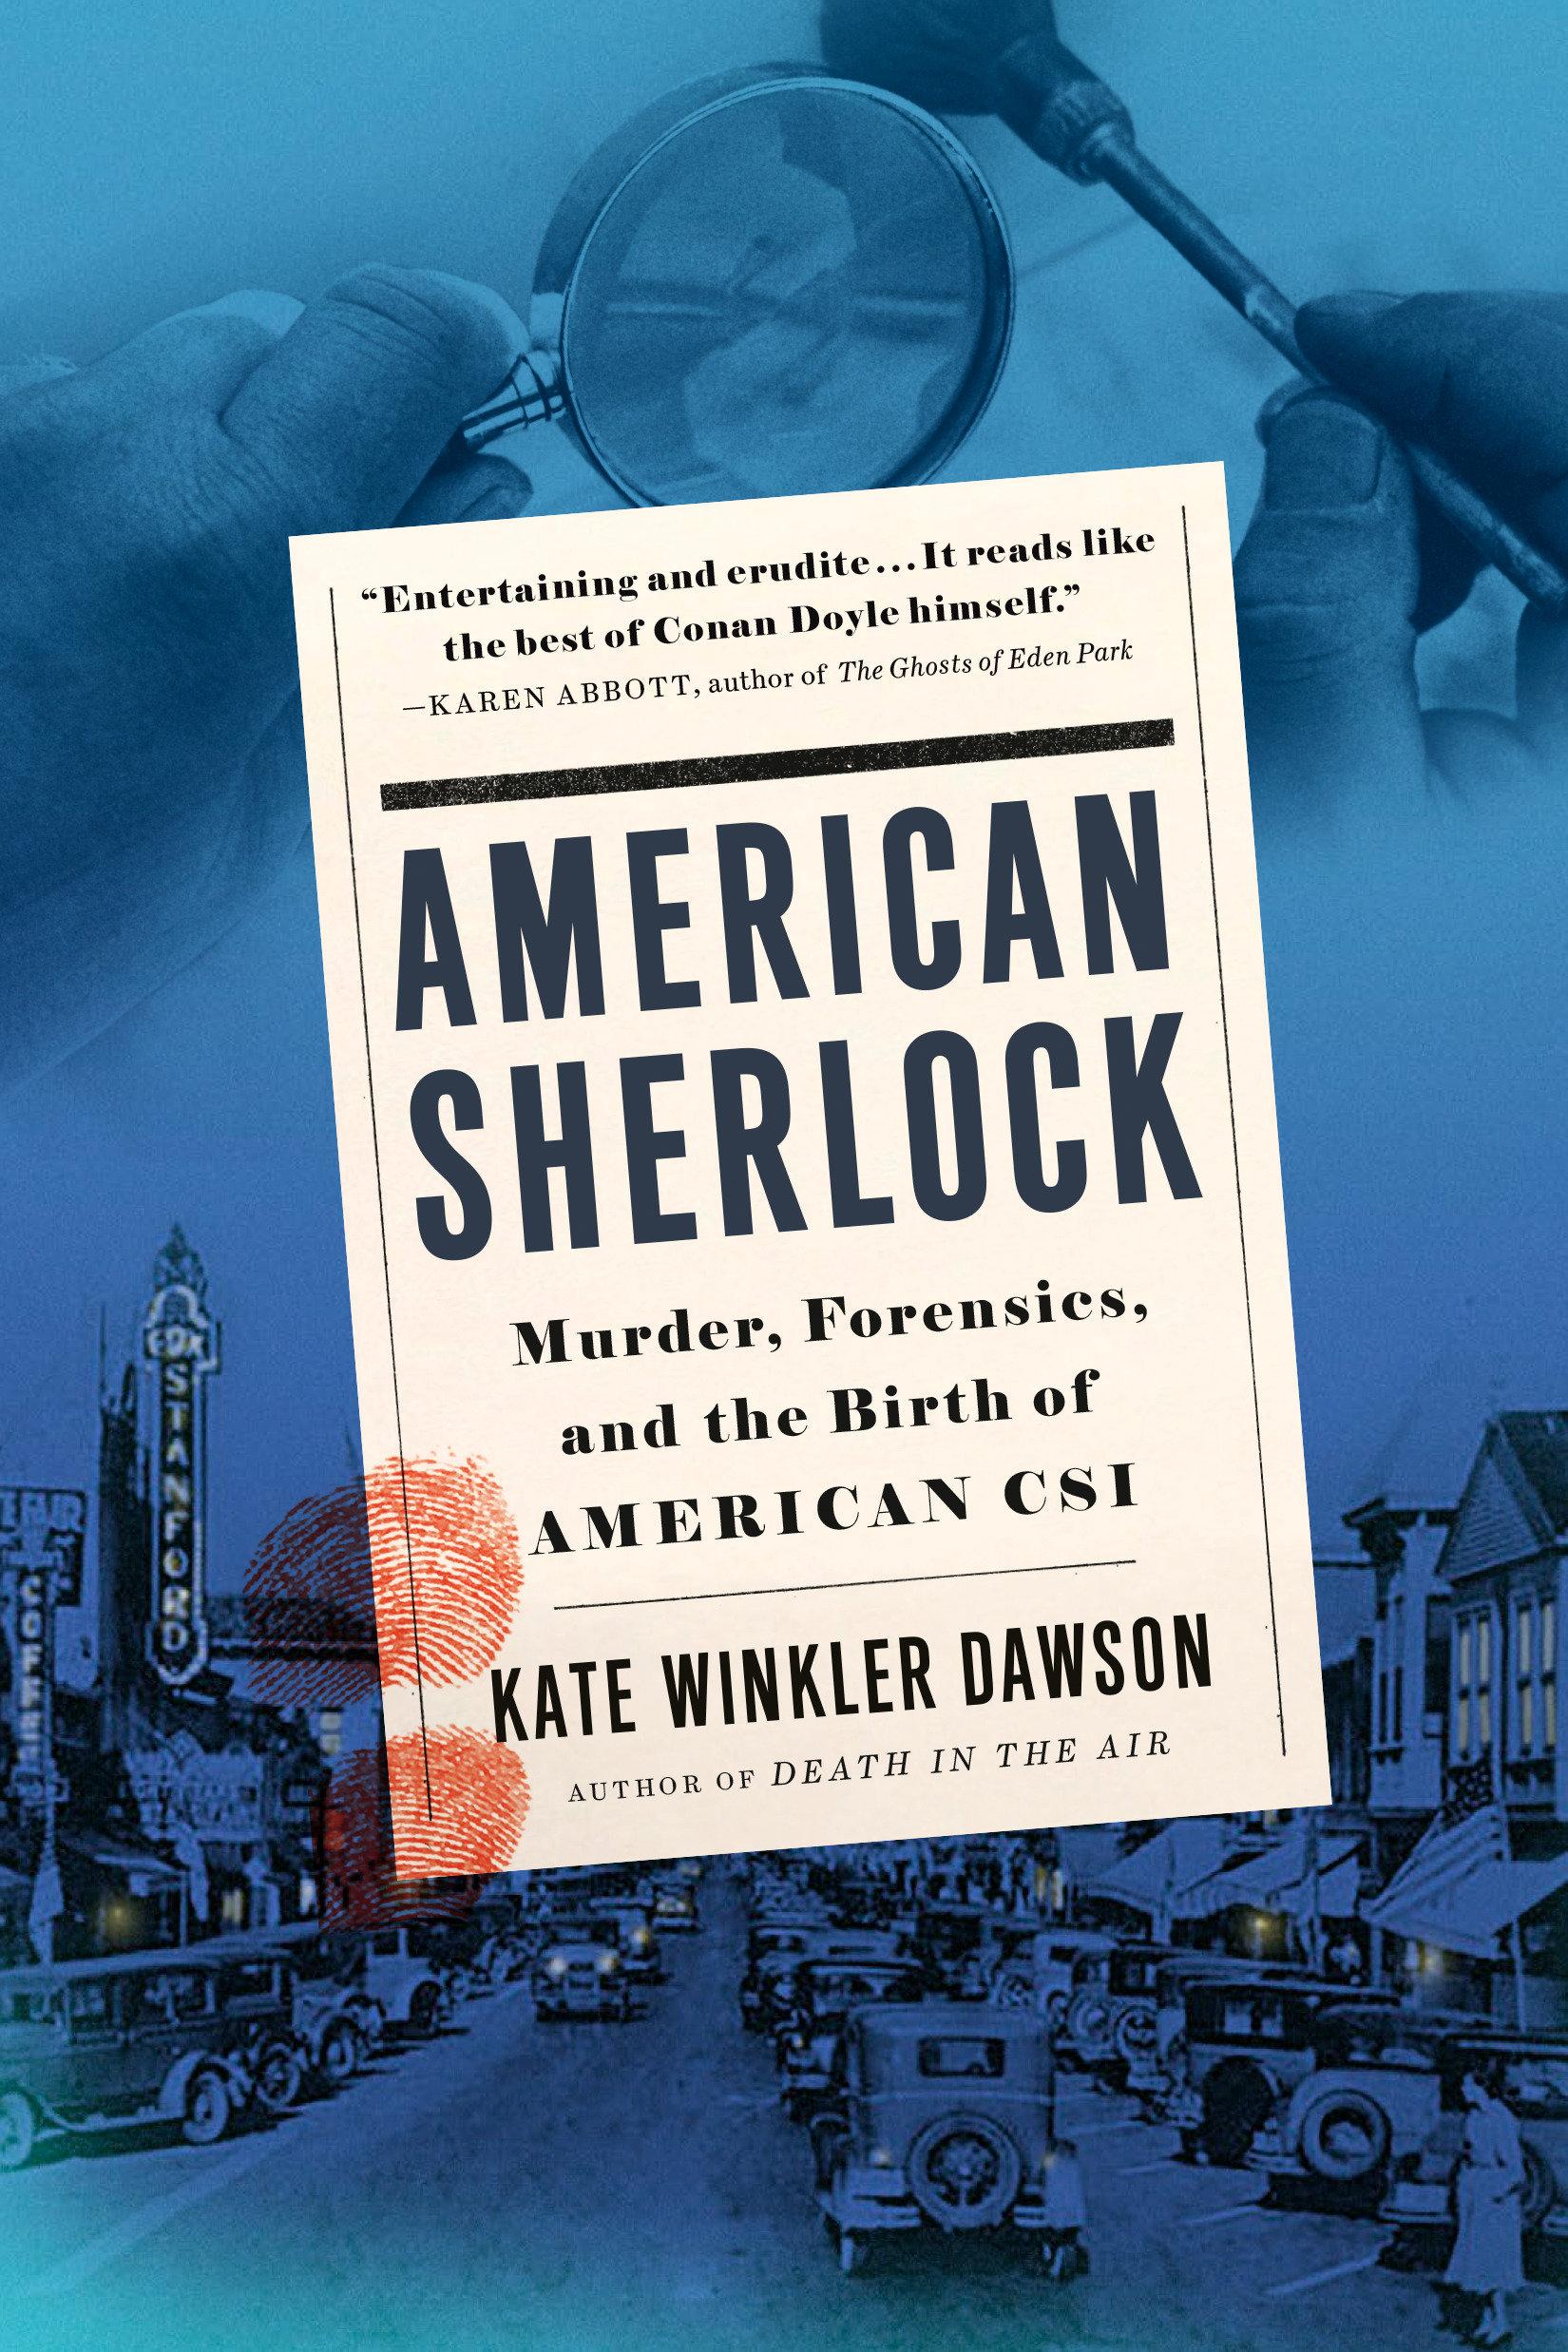 American Sherlock [electronic resource] : Murder, Forensics, and the Birth of American CSI